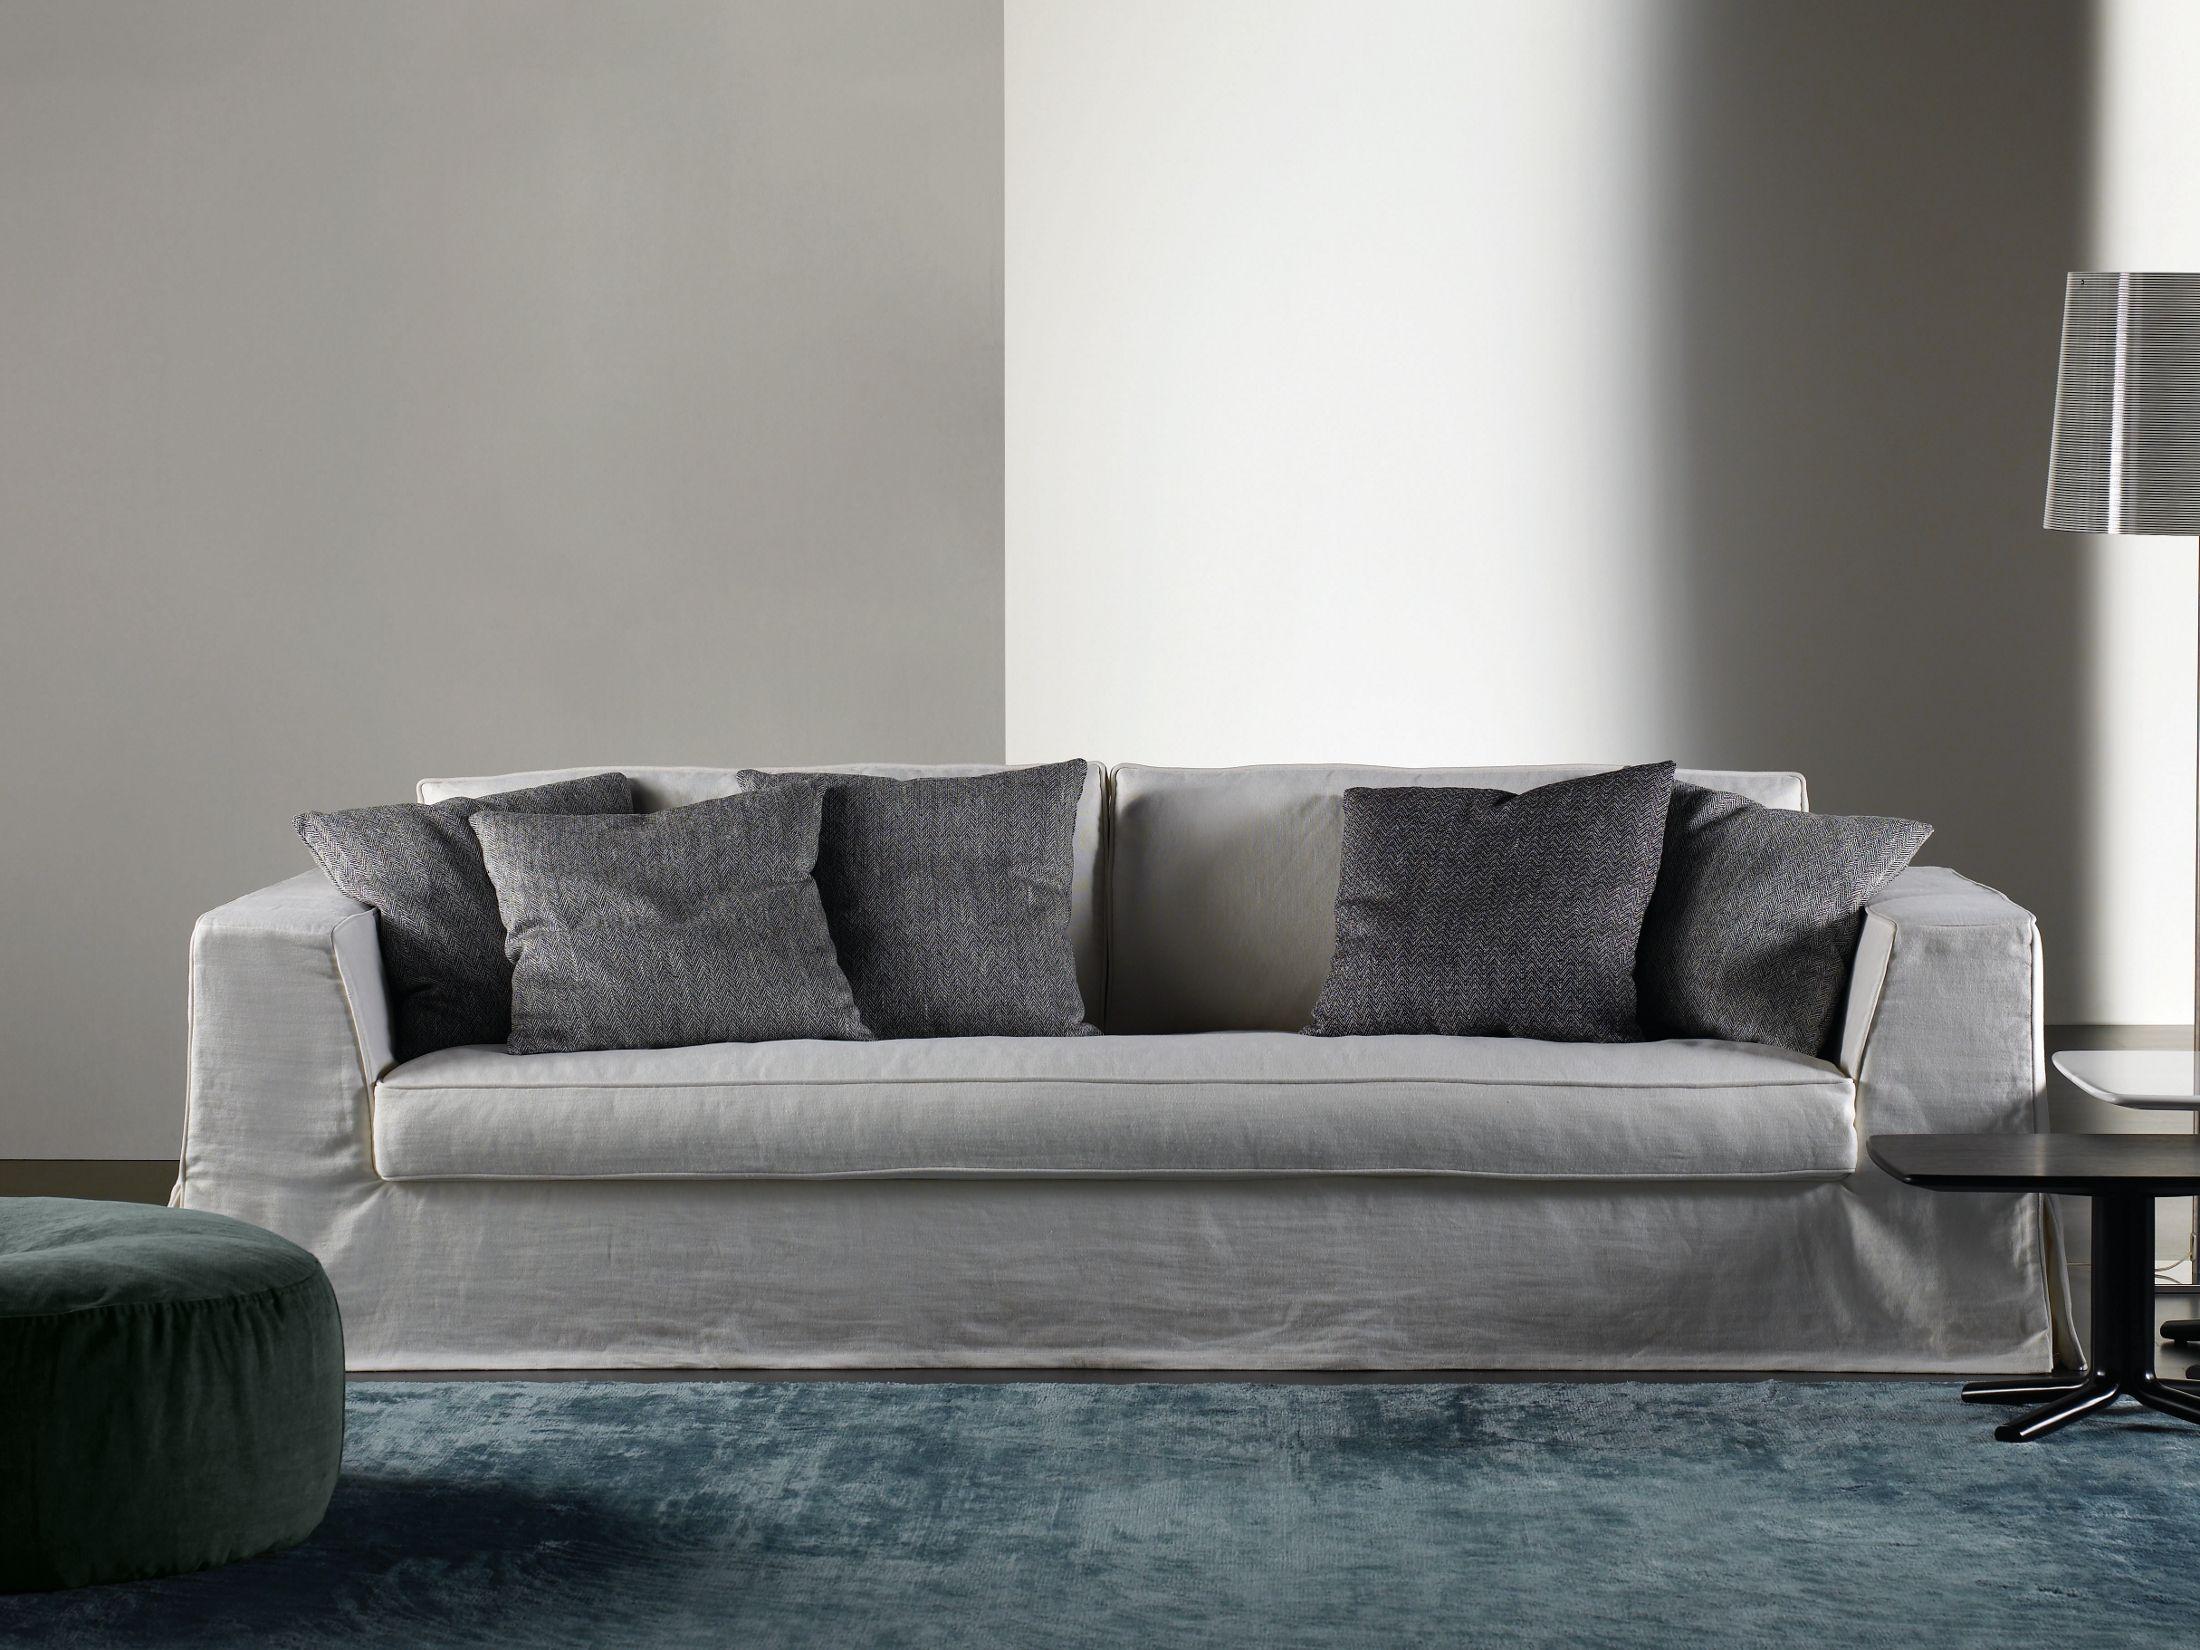 guinn sofa by meridiani. Black Bedroom Furniture Sets. Home Design Ideas